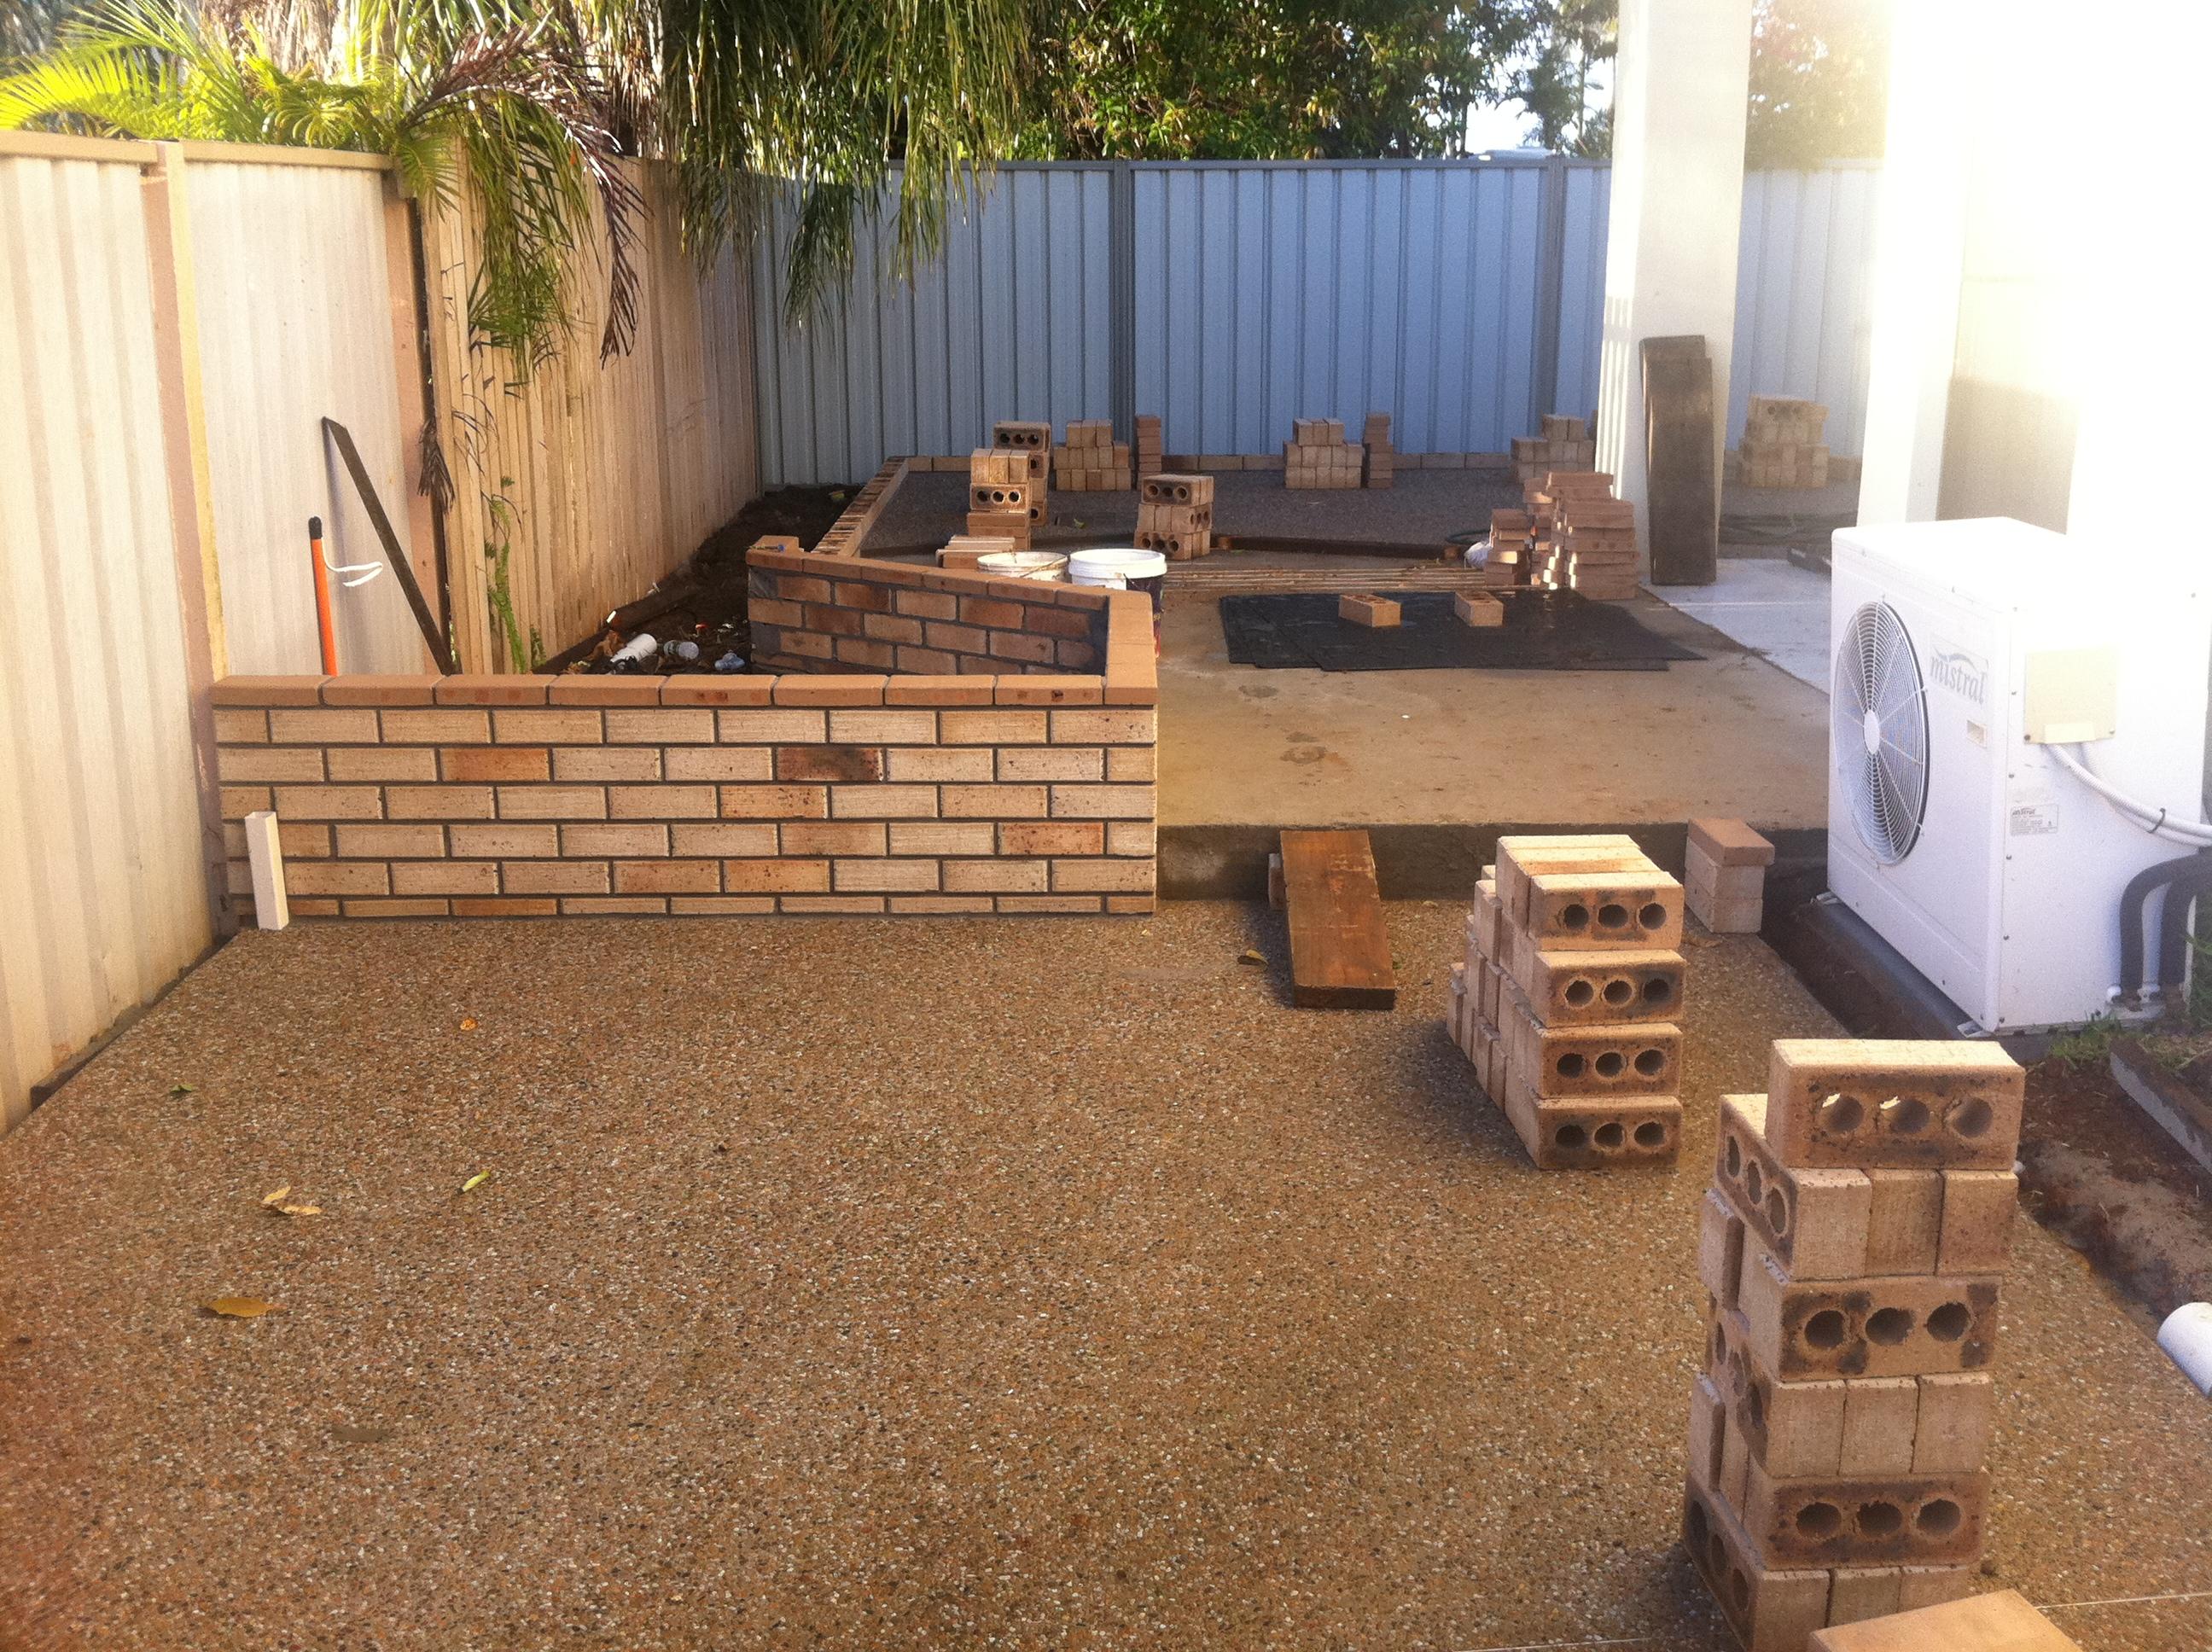 raised brick gardens being laid in courtyard landscape | Lifestyle ...